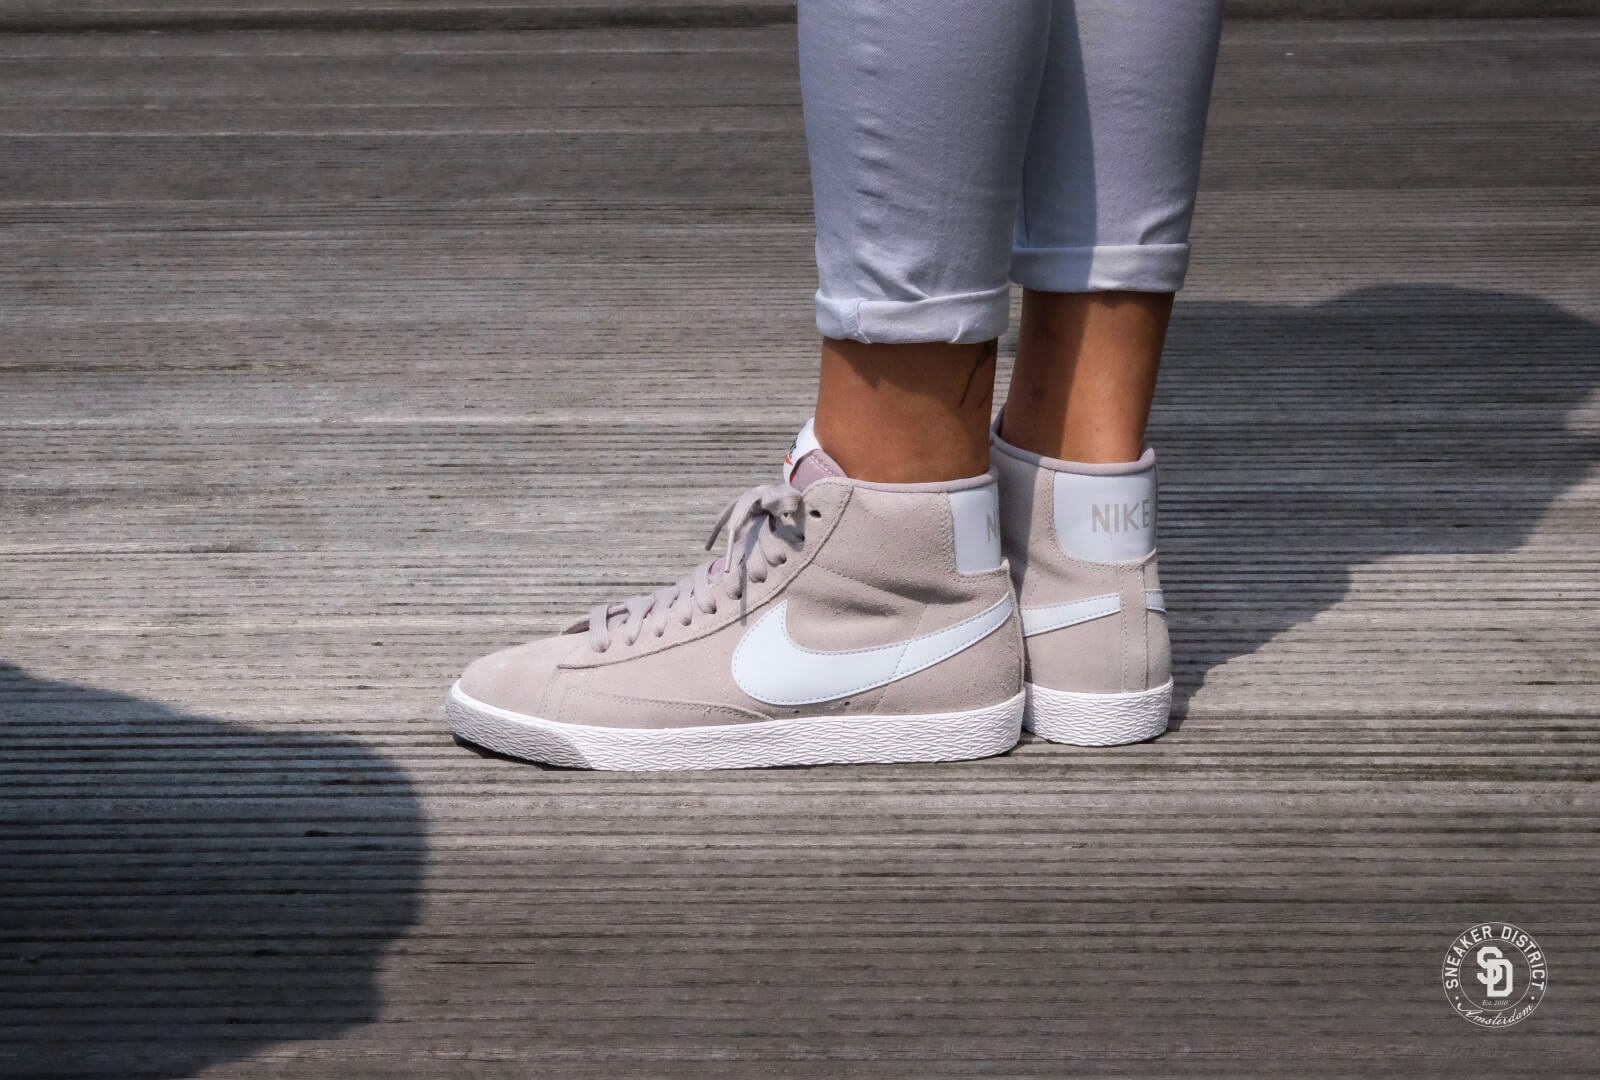 Nike Blazer Mid Semsket Skinn Vintage JMWaFxB1fo